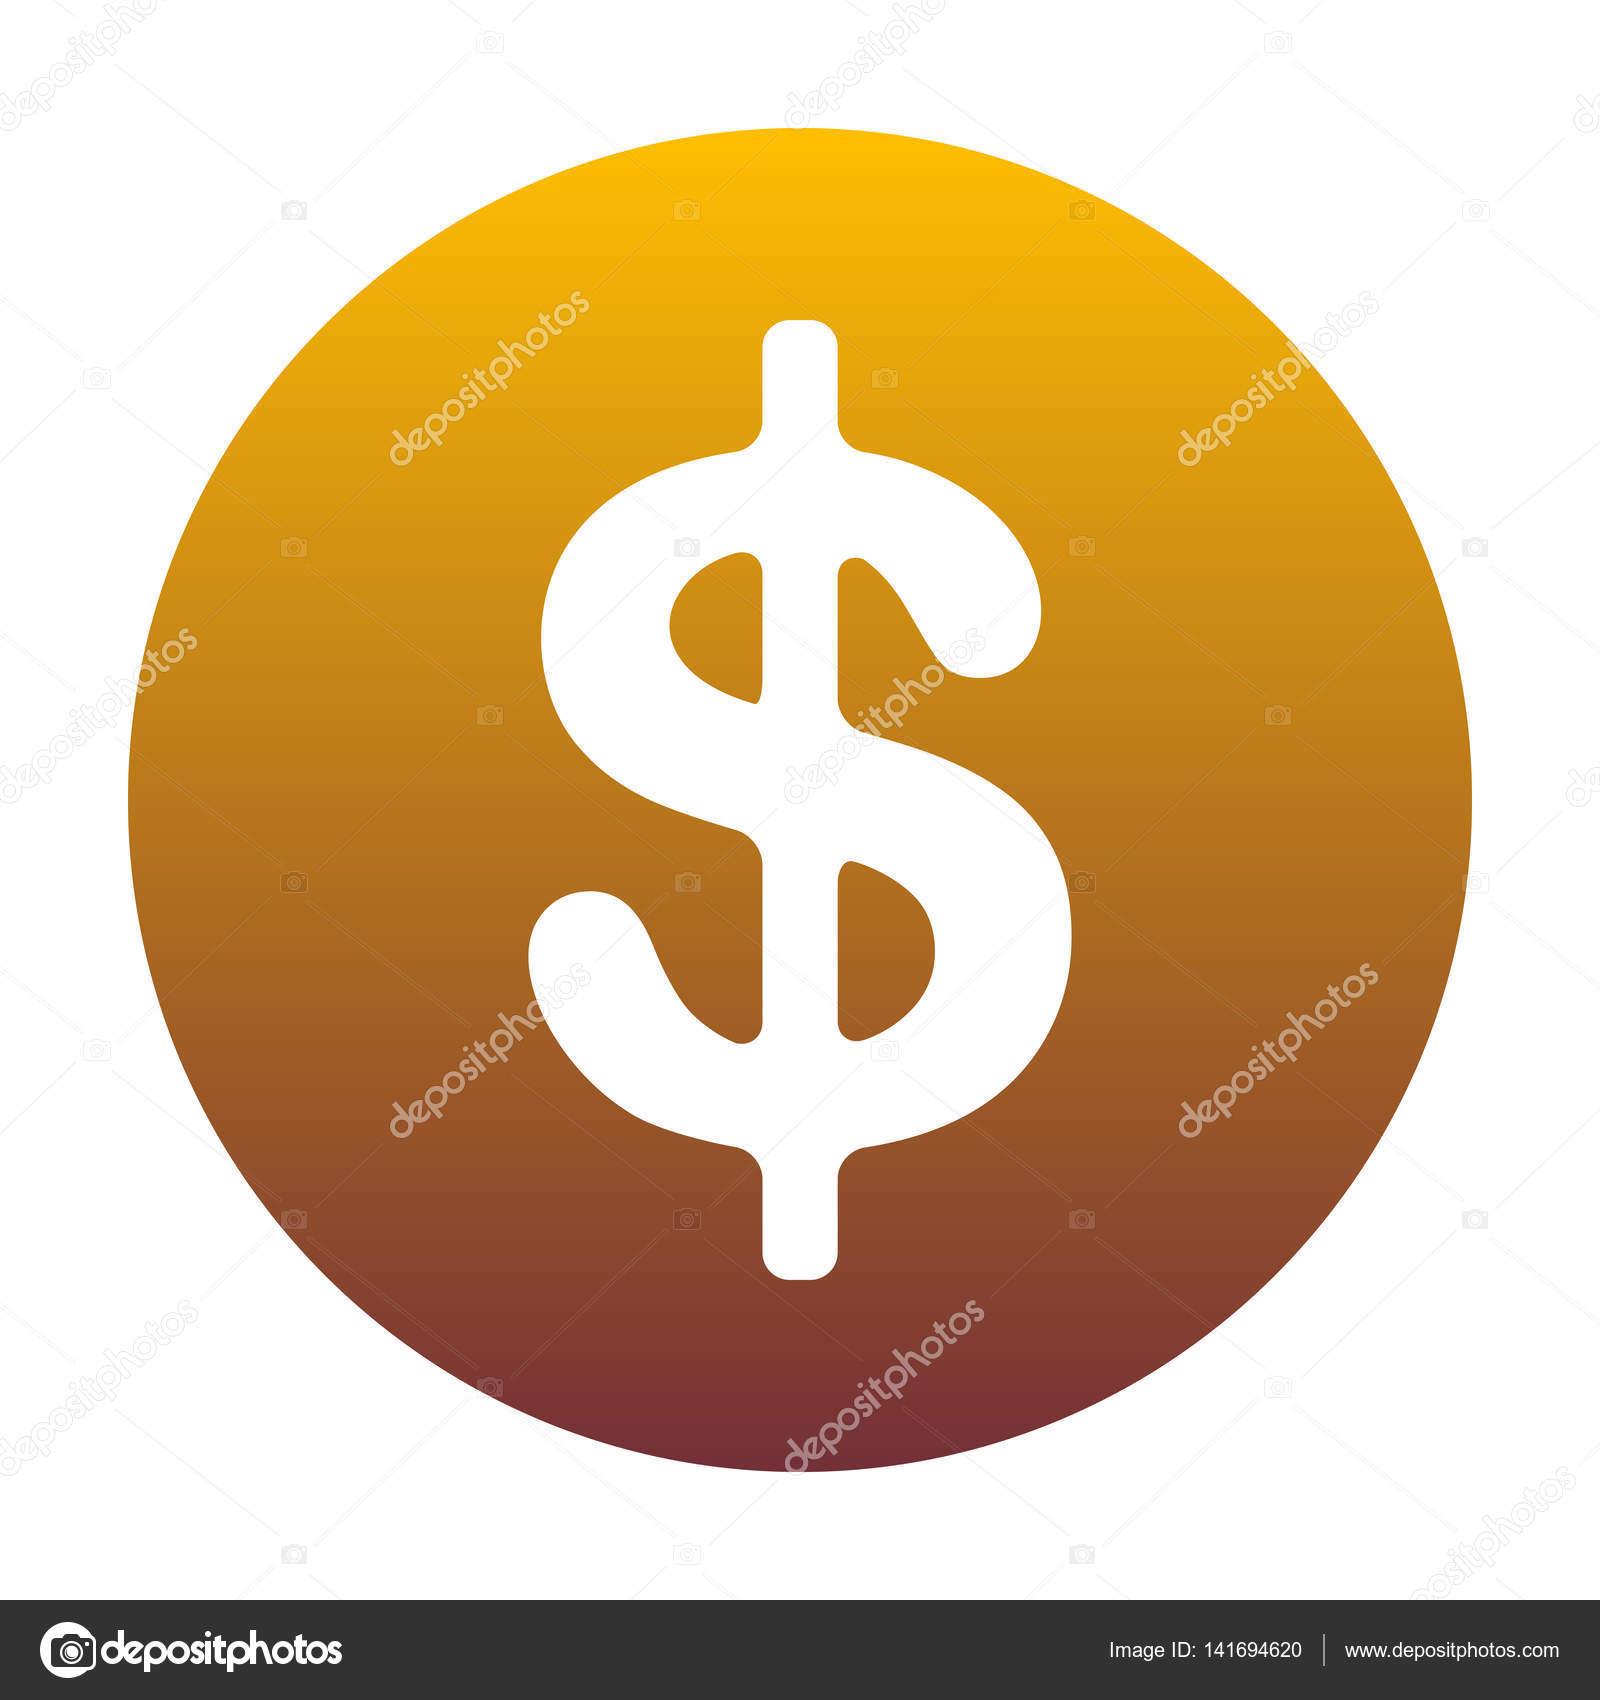 Dollars Sign Illustration Usd Currency Symbol Money Label Whi